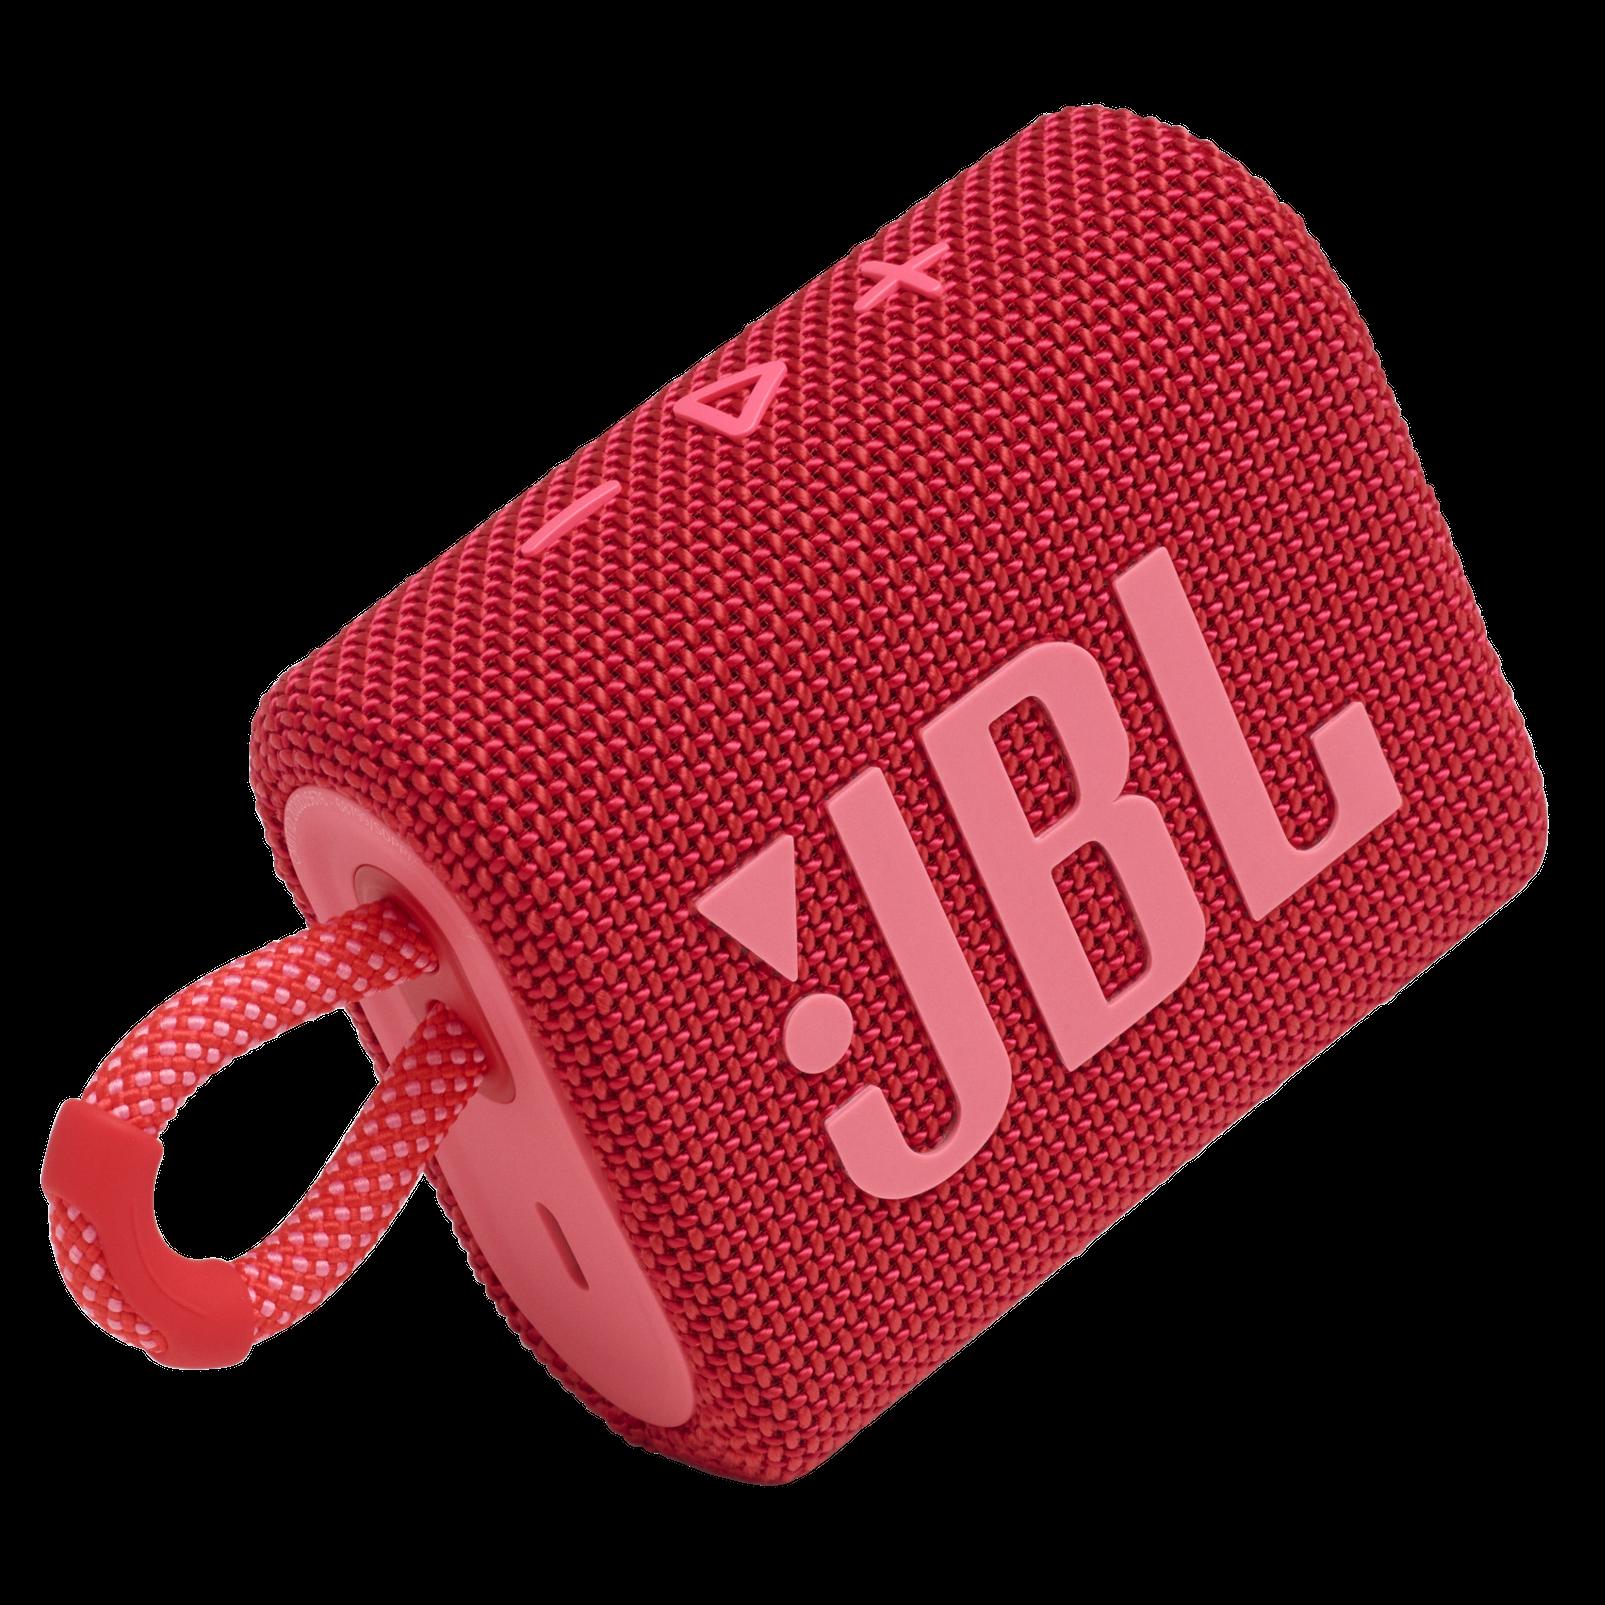 JBL Go 3 - Red - Portable Waterproof Speaker - Detailshot 1